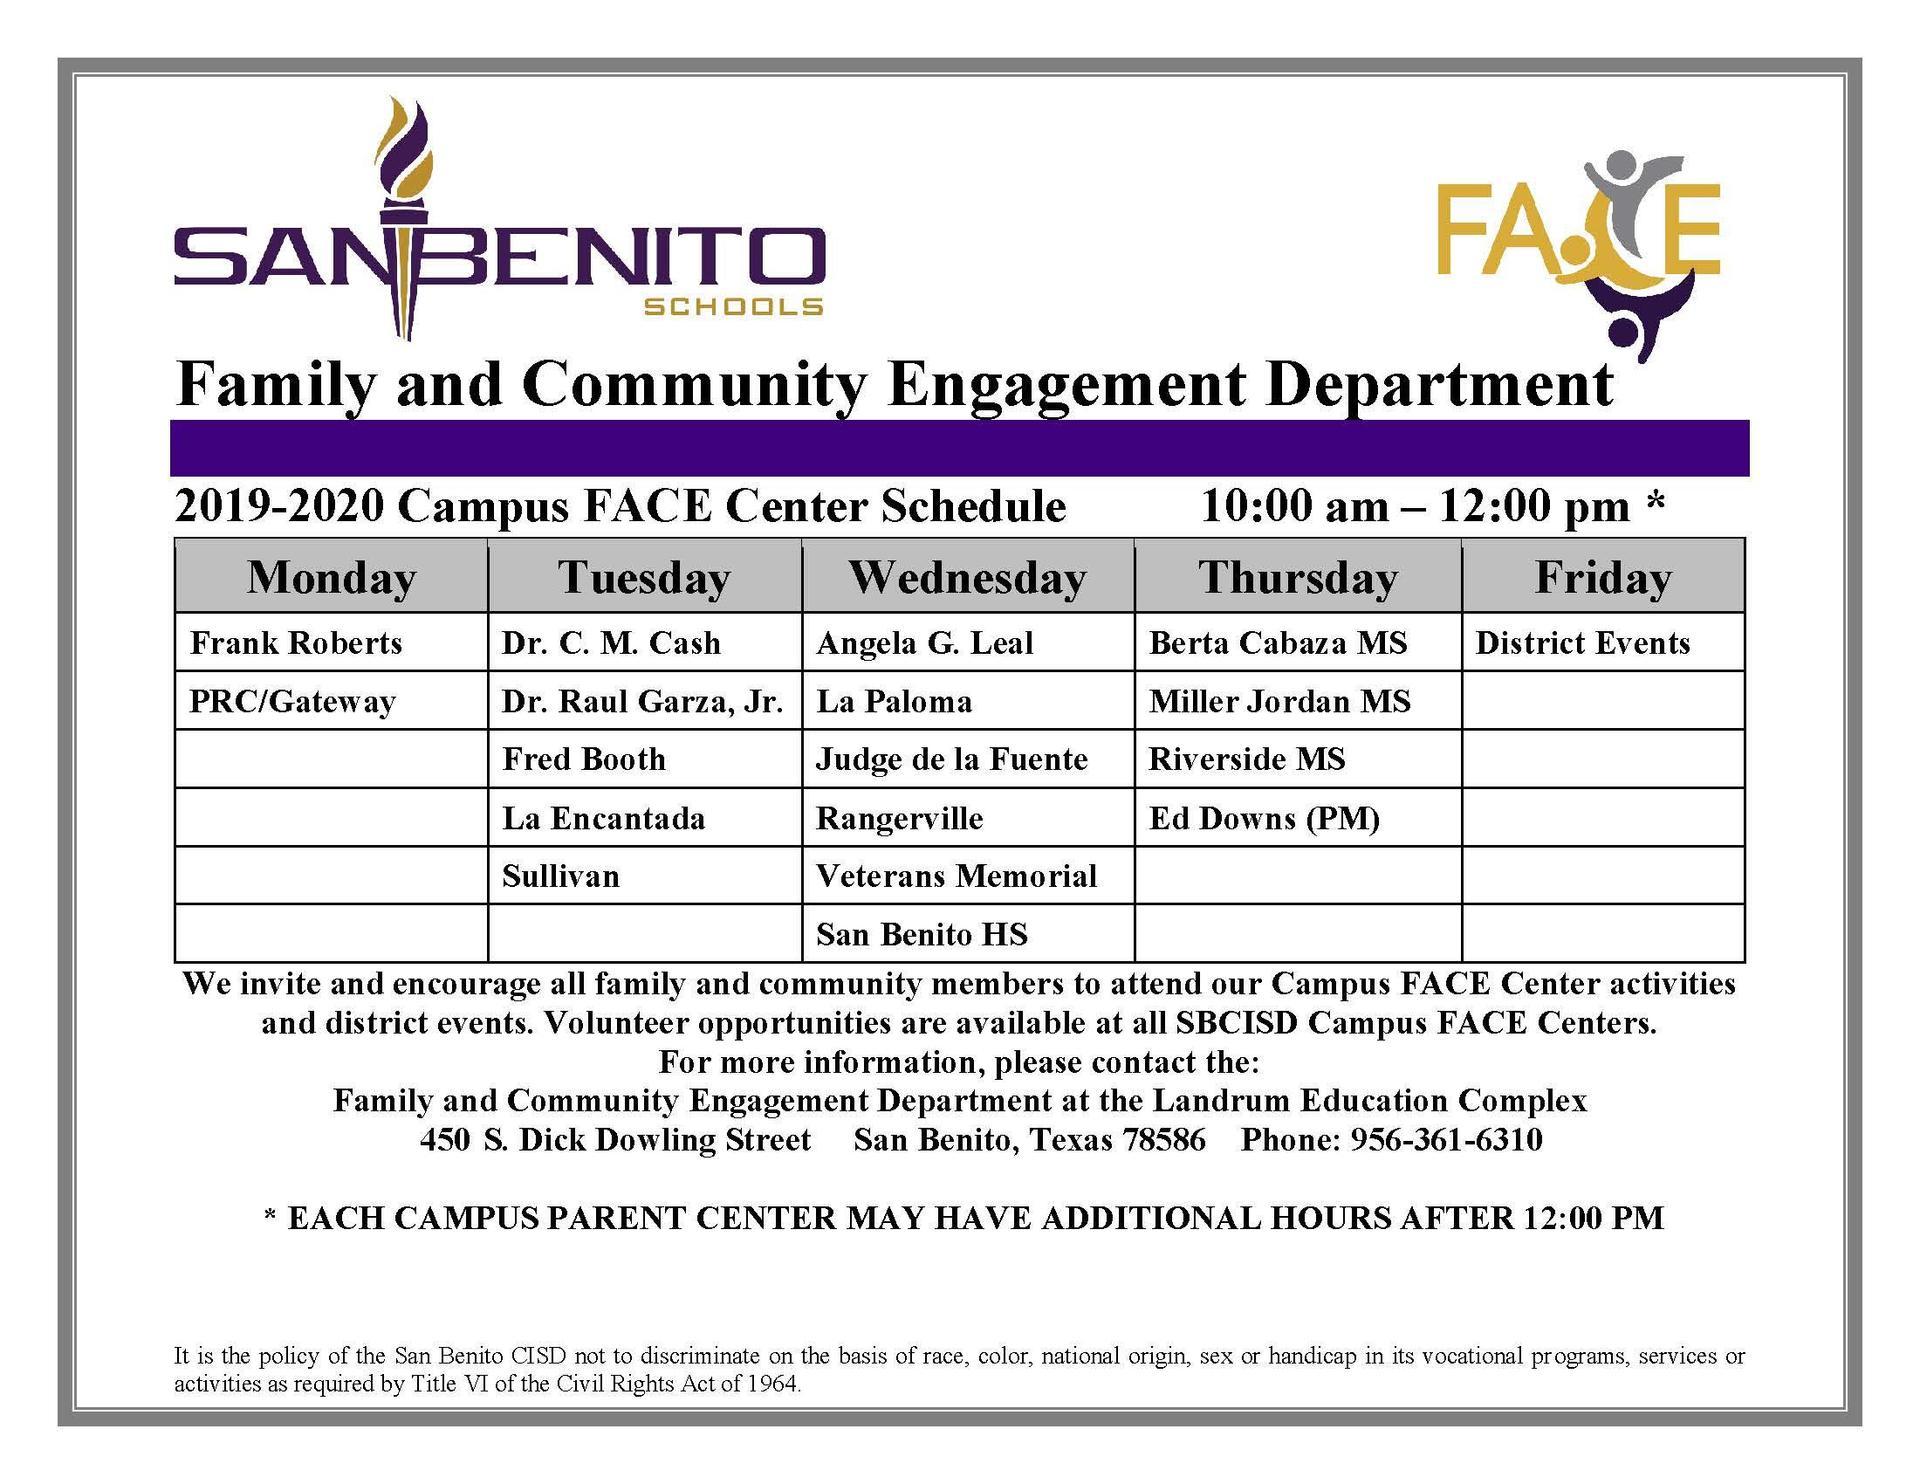 2019-2020 FACE Center Schedule